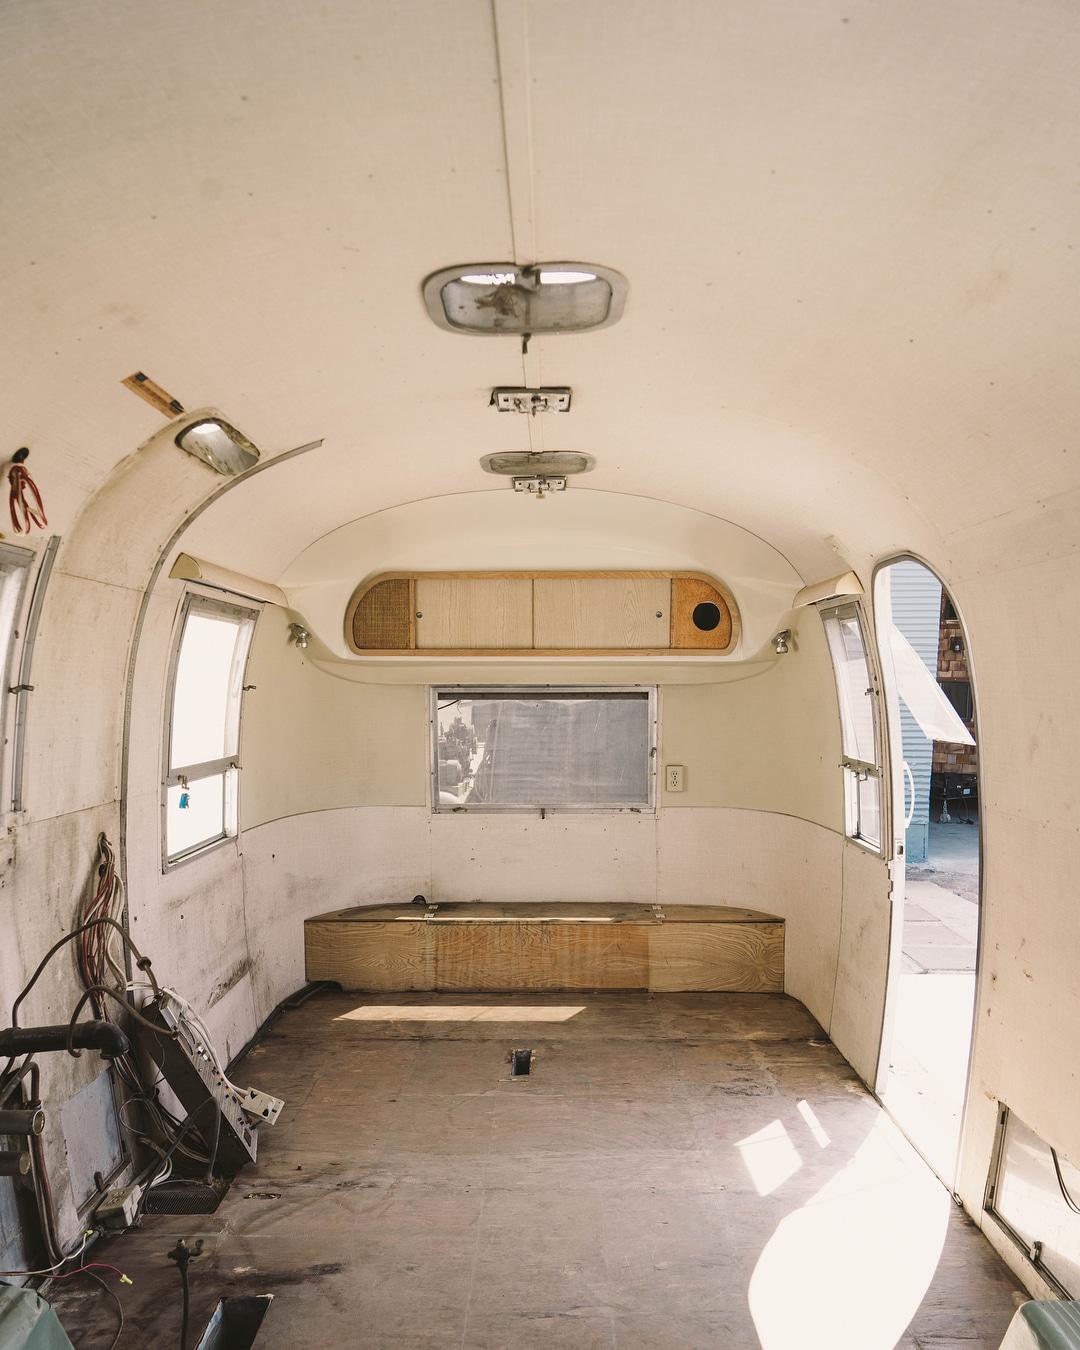 airstream trailer - Interior designer turned heirloom Airstream into delightful home